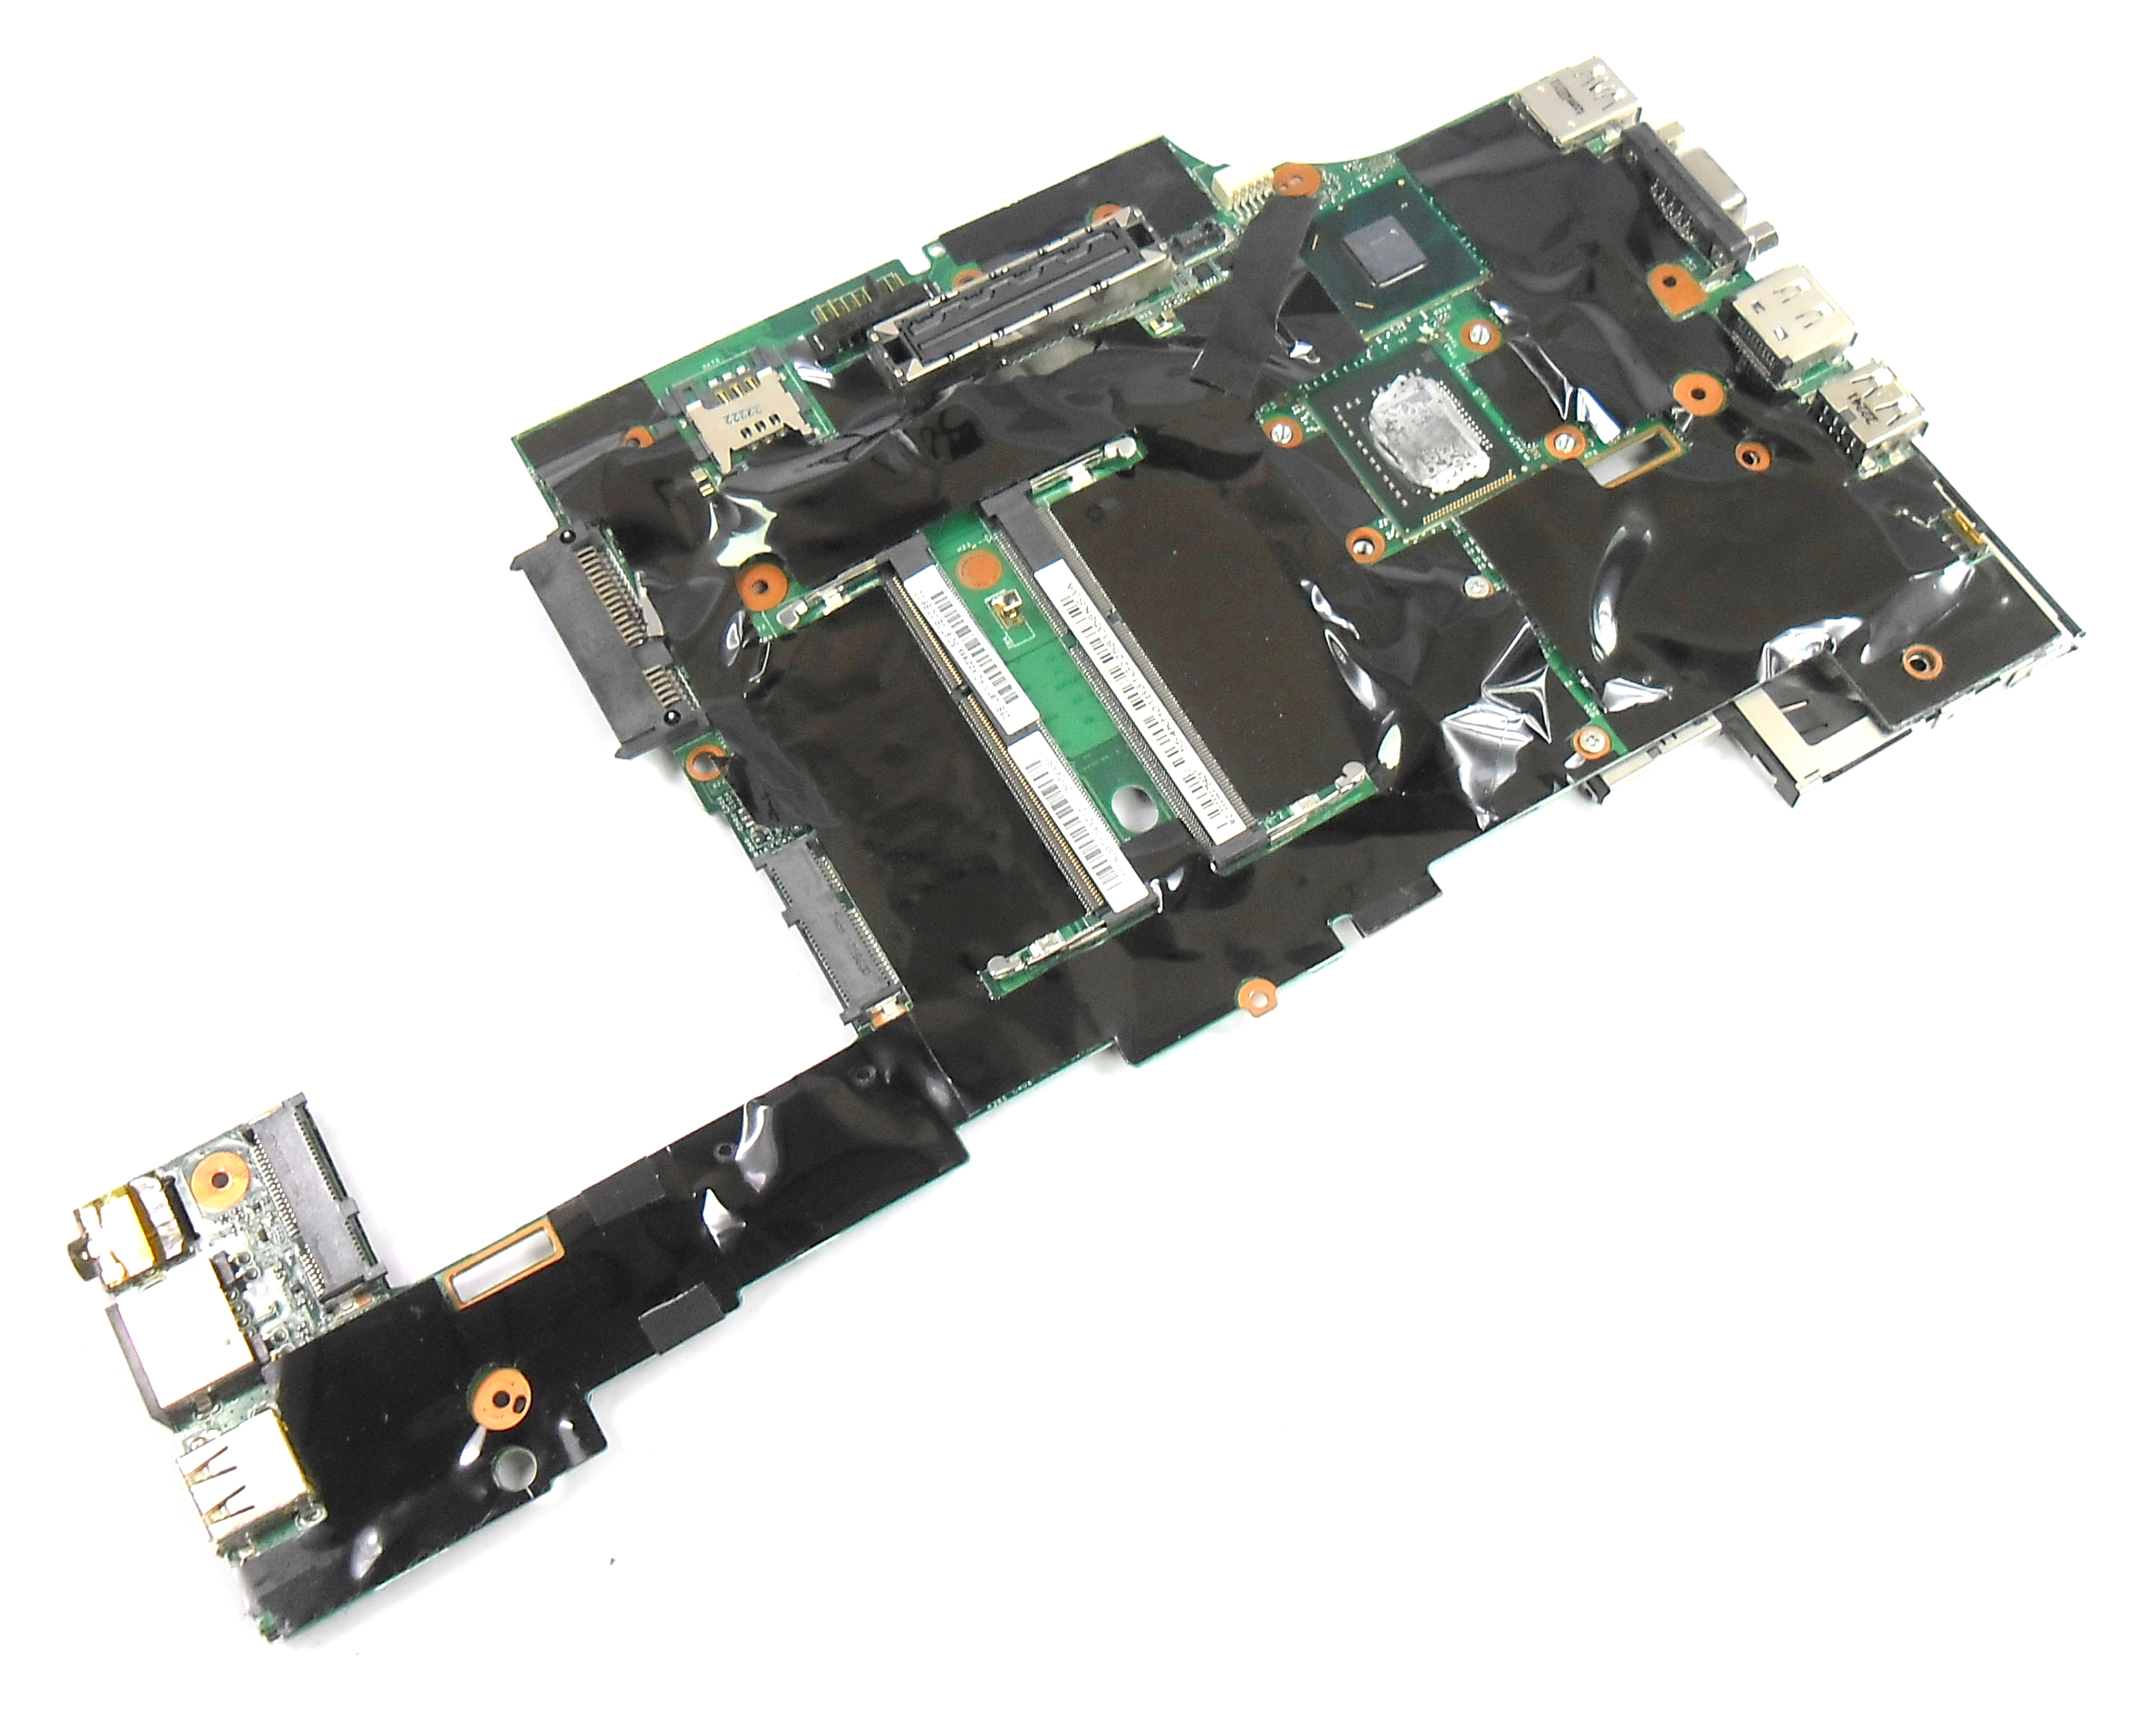 Lenovo 04W0680  ThinkPad X220 Motherboard with Intel i5-2540M Processor